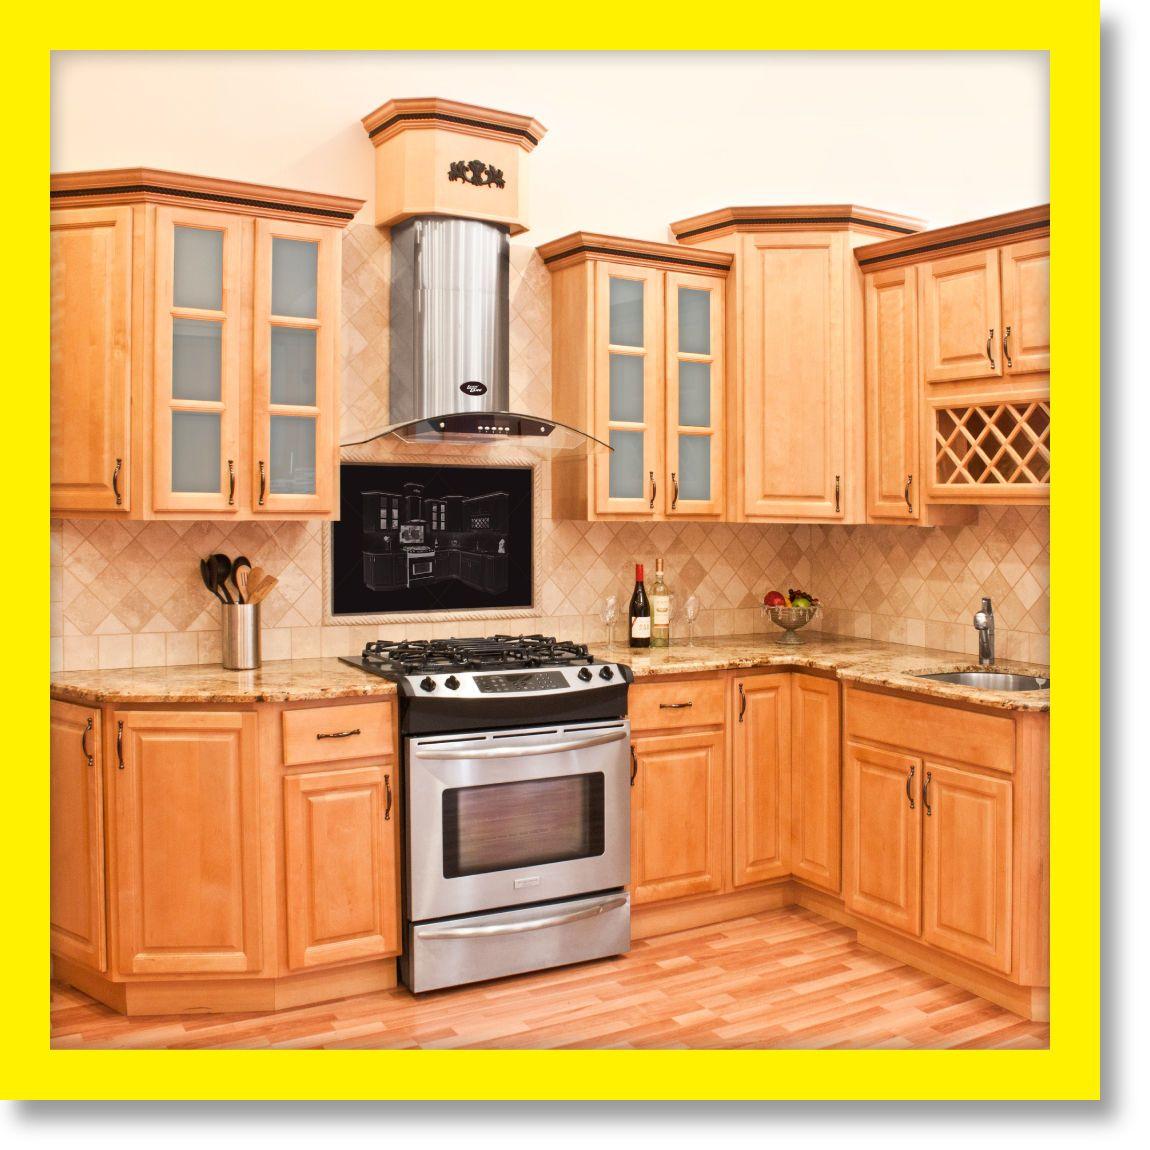 10x10 All Wood Kitchen Cabinets Rta Richmond 816124022510 Ebay Maple Kitchen Cabinets Kitchen Remodel Small Kitchen Remodel